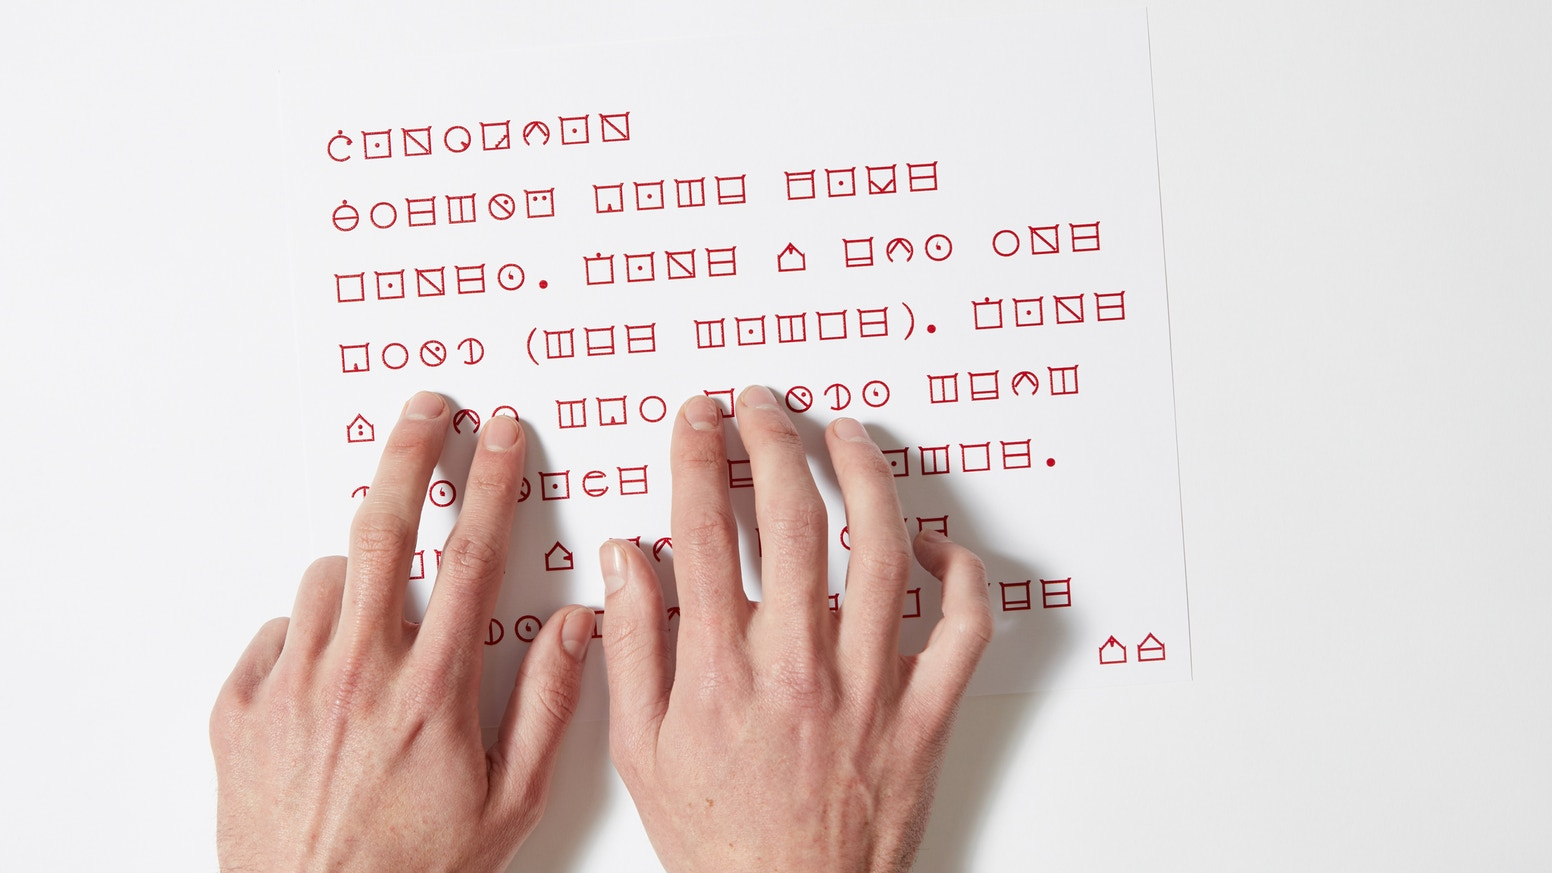 ELIA tactile reading system